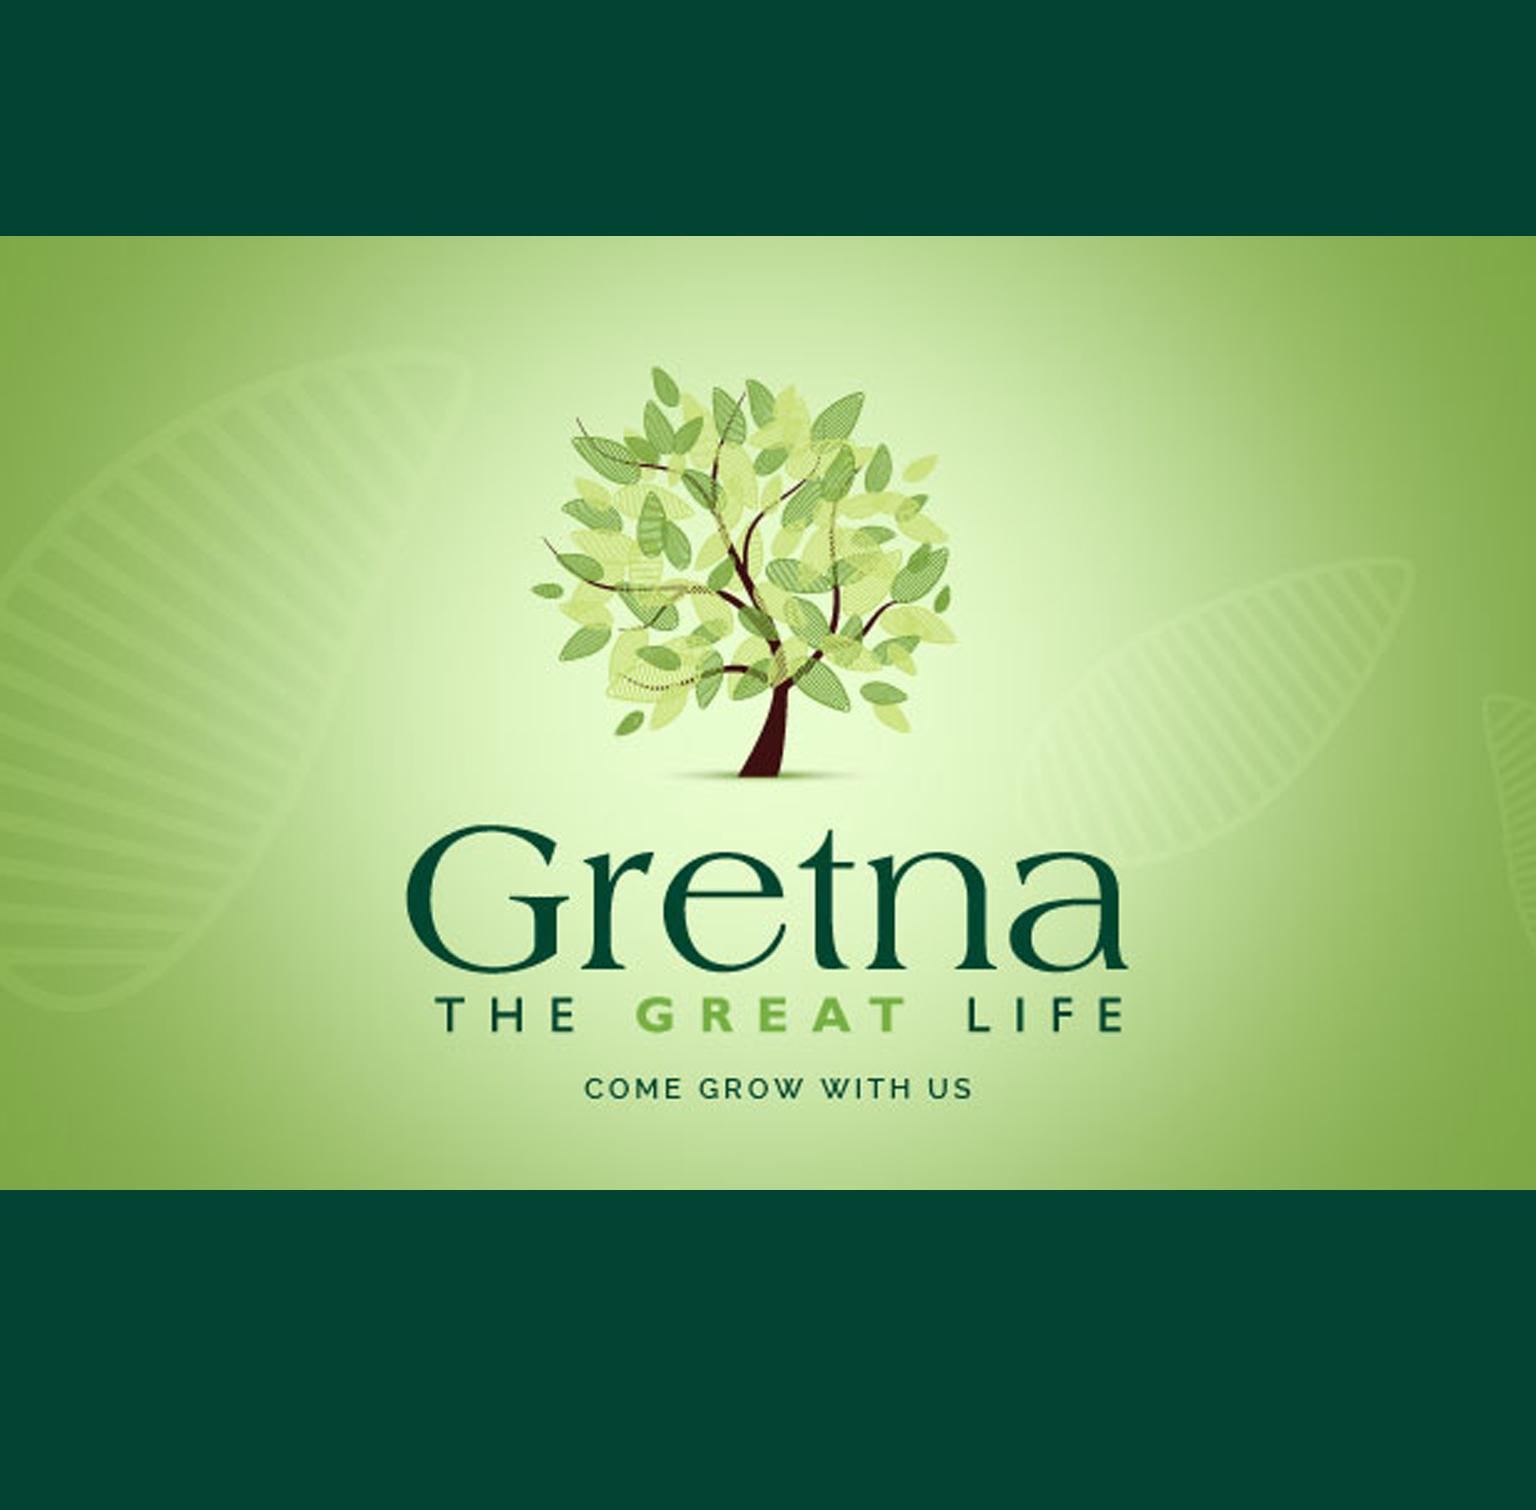 Gretna Tree Board Meeting